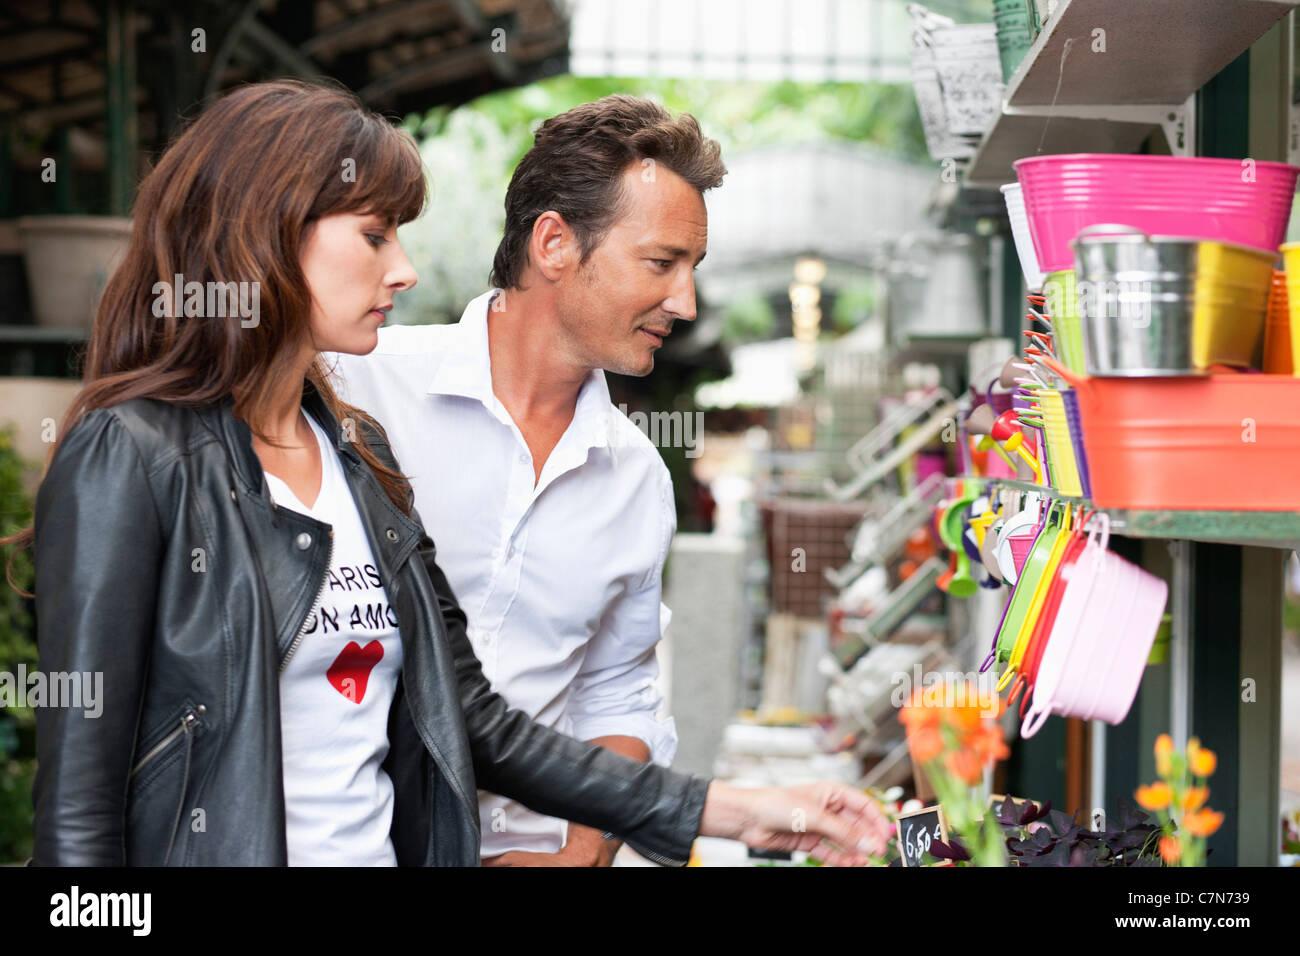 Couple shopping at a market stall, Paris, Ile-de-France, France - Stock Image